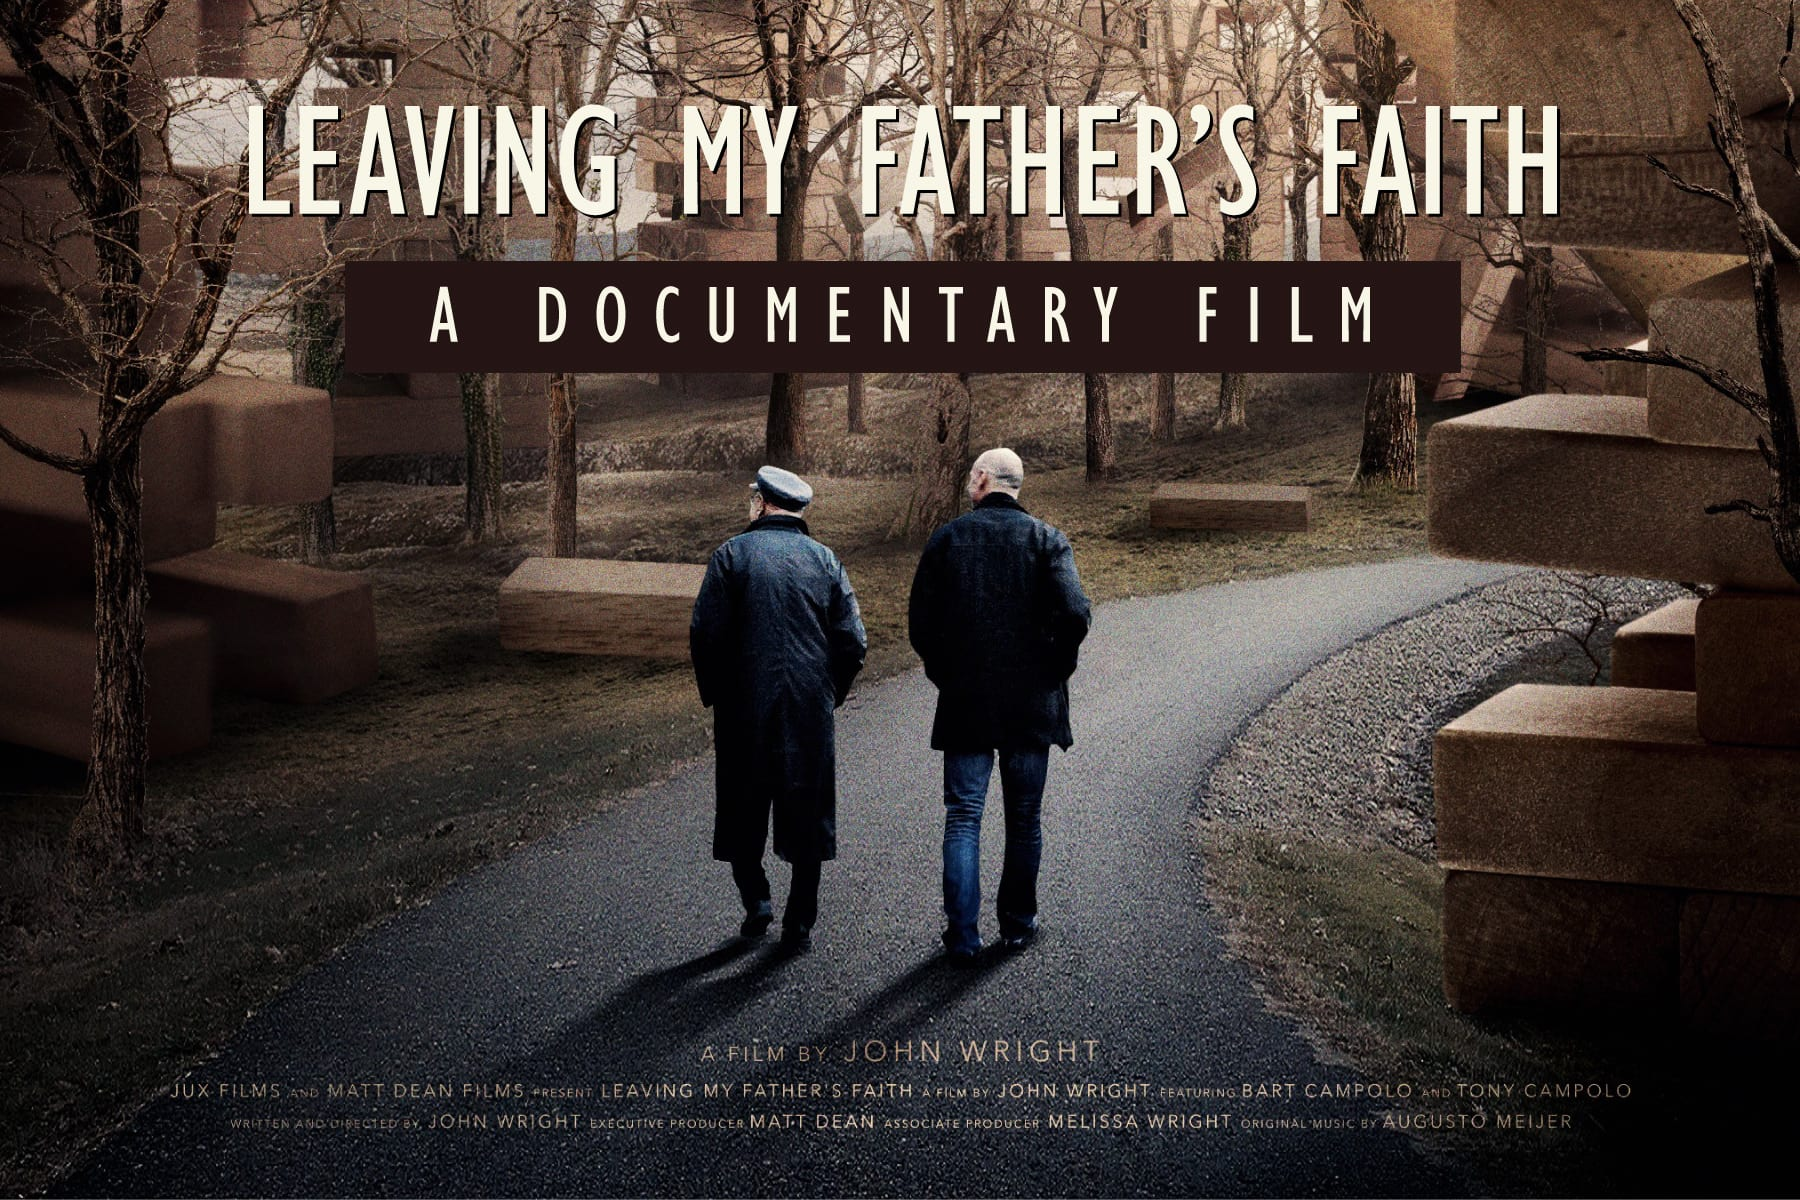 Leaving My Father's Faith (2017) - John Wright